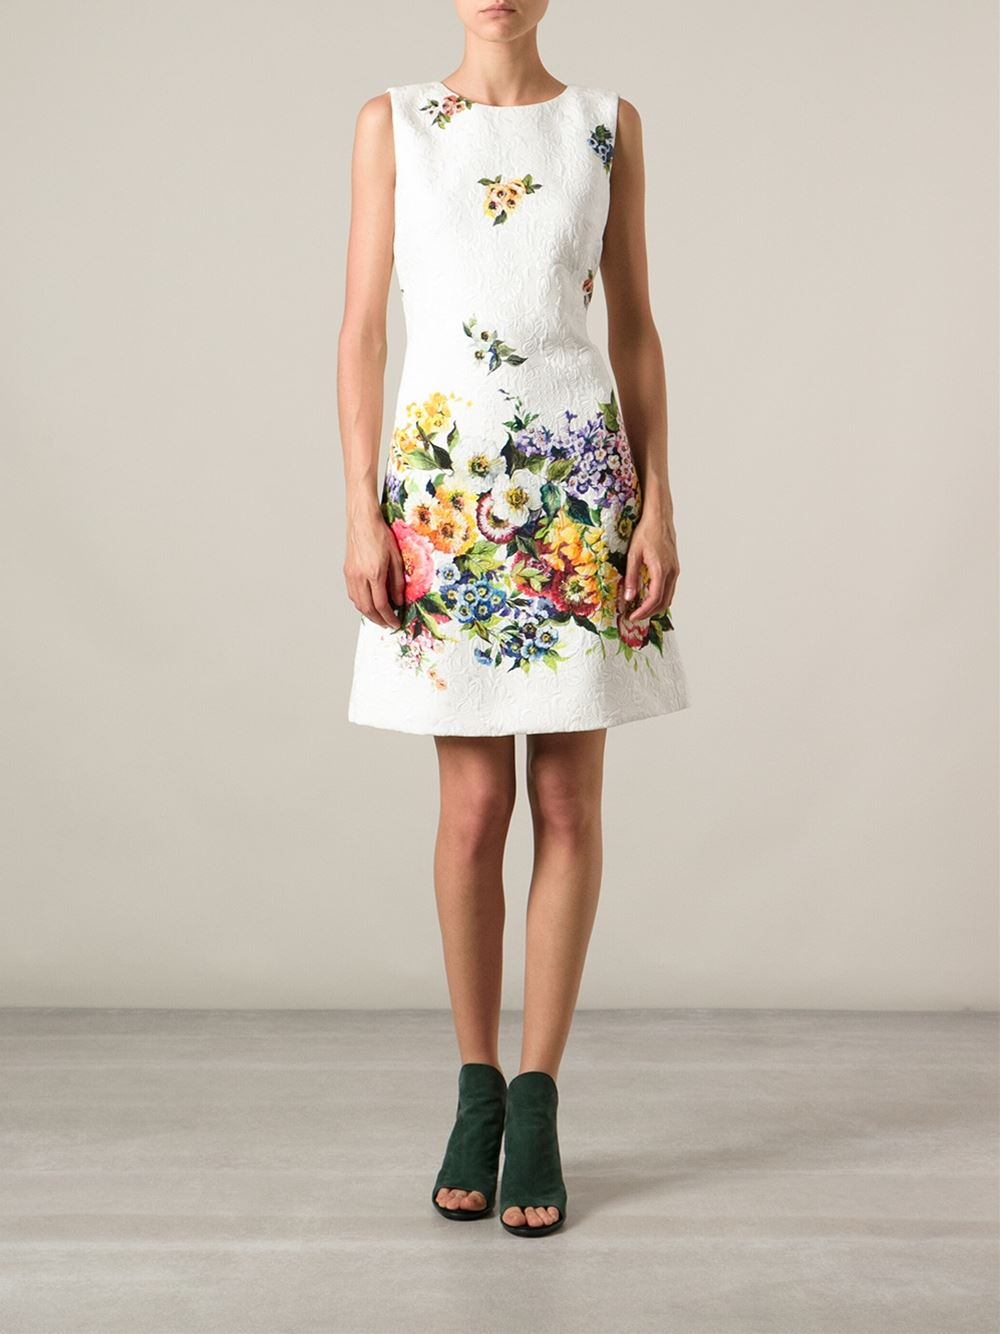 dcabccfc Dolce & Gabbana Floral Print Dress in White - Lyst